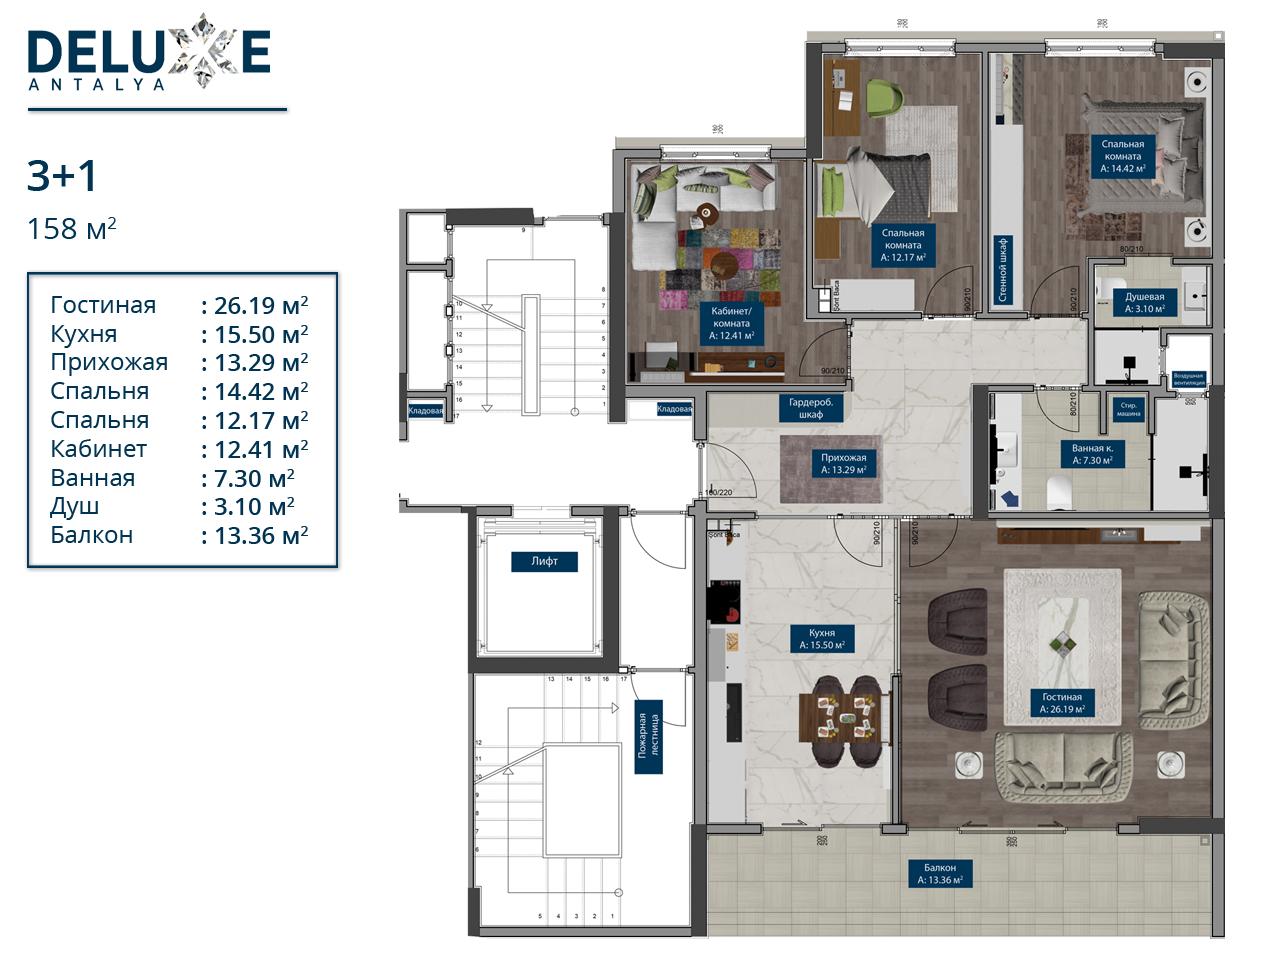 4-комнатные, 158 м² 3 спальни + 1 зал